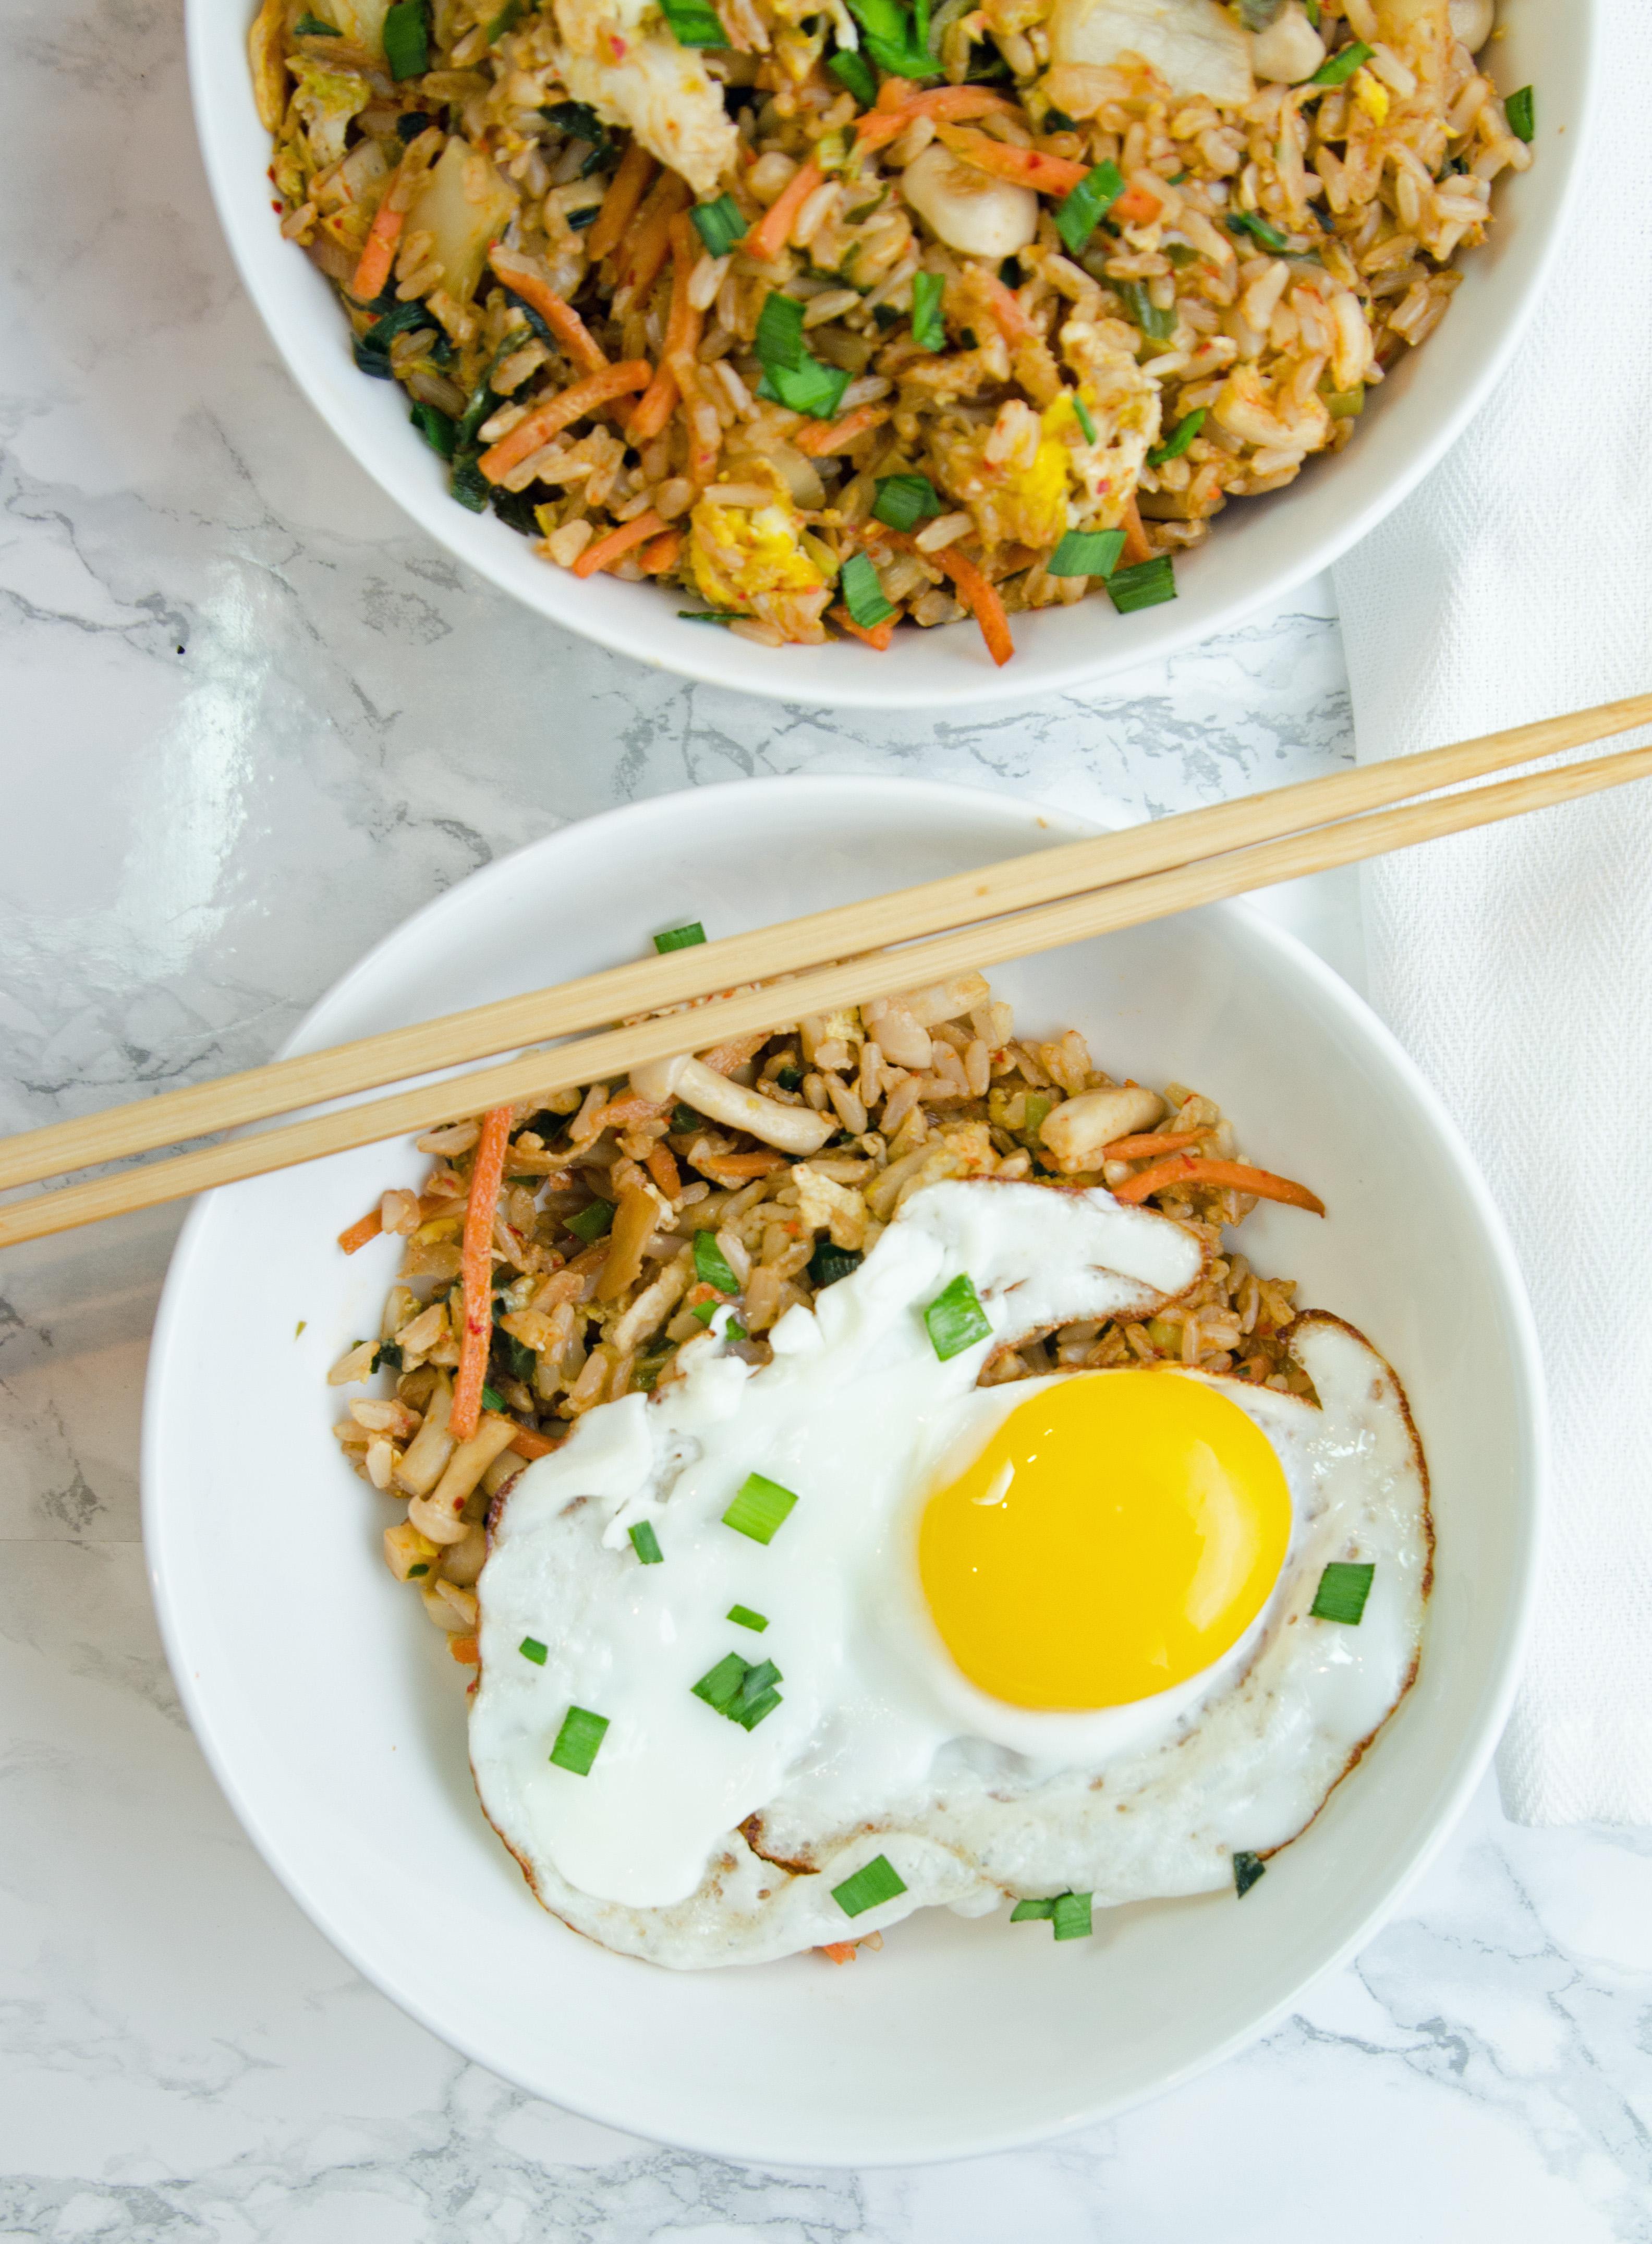 Kimchi Fried Rice with Egg